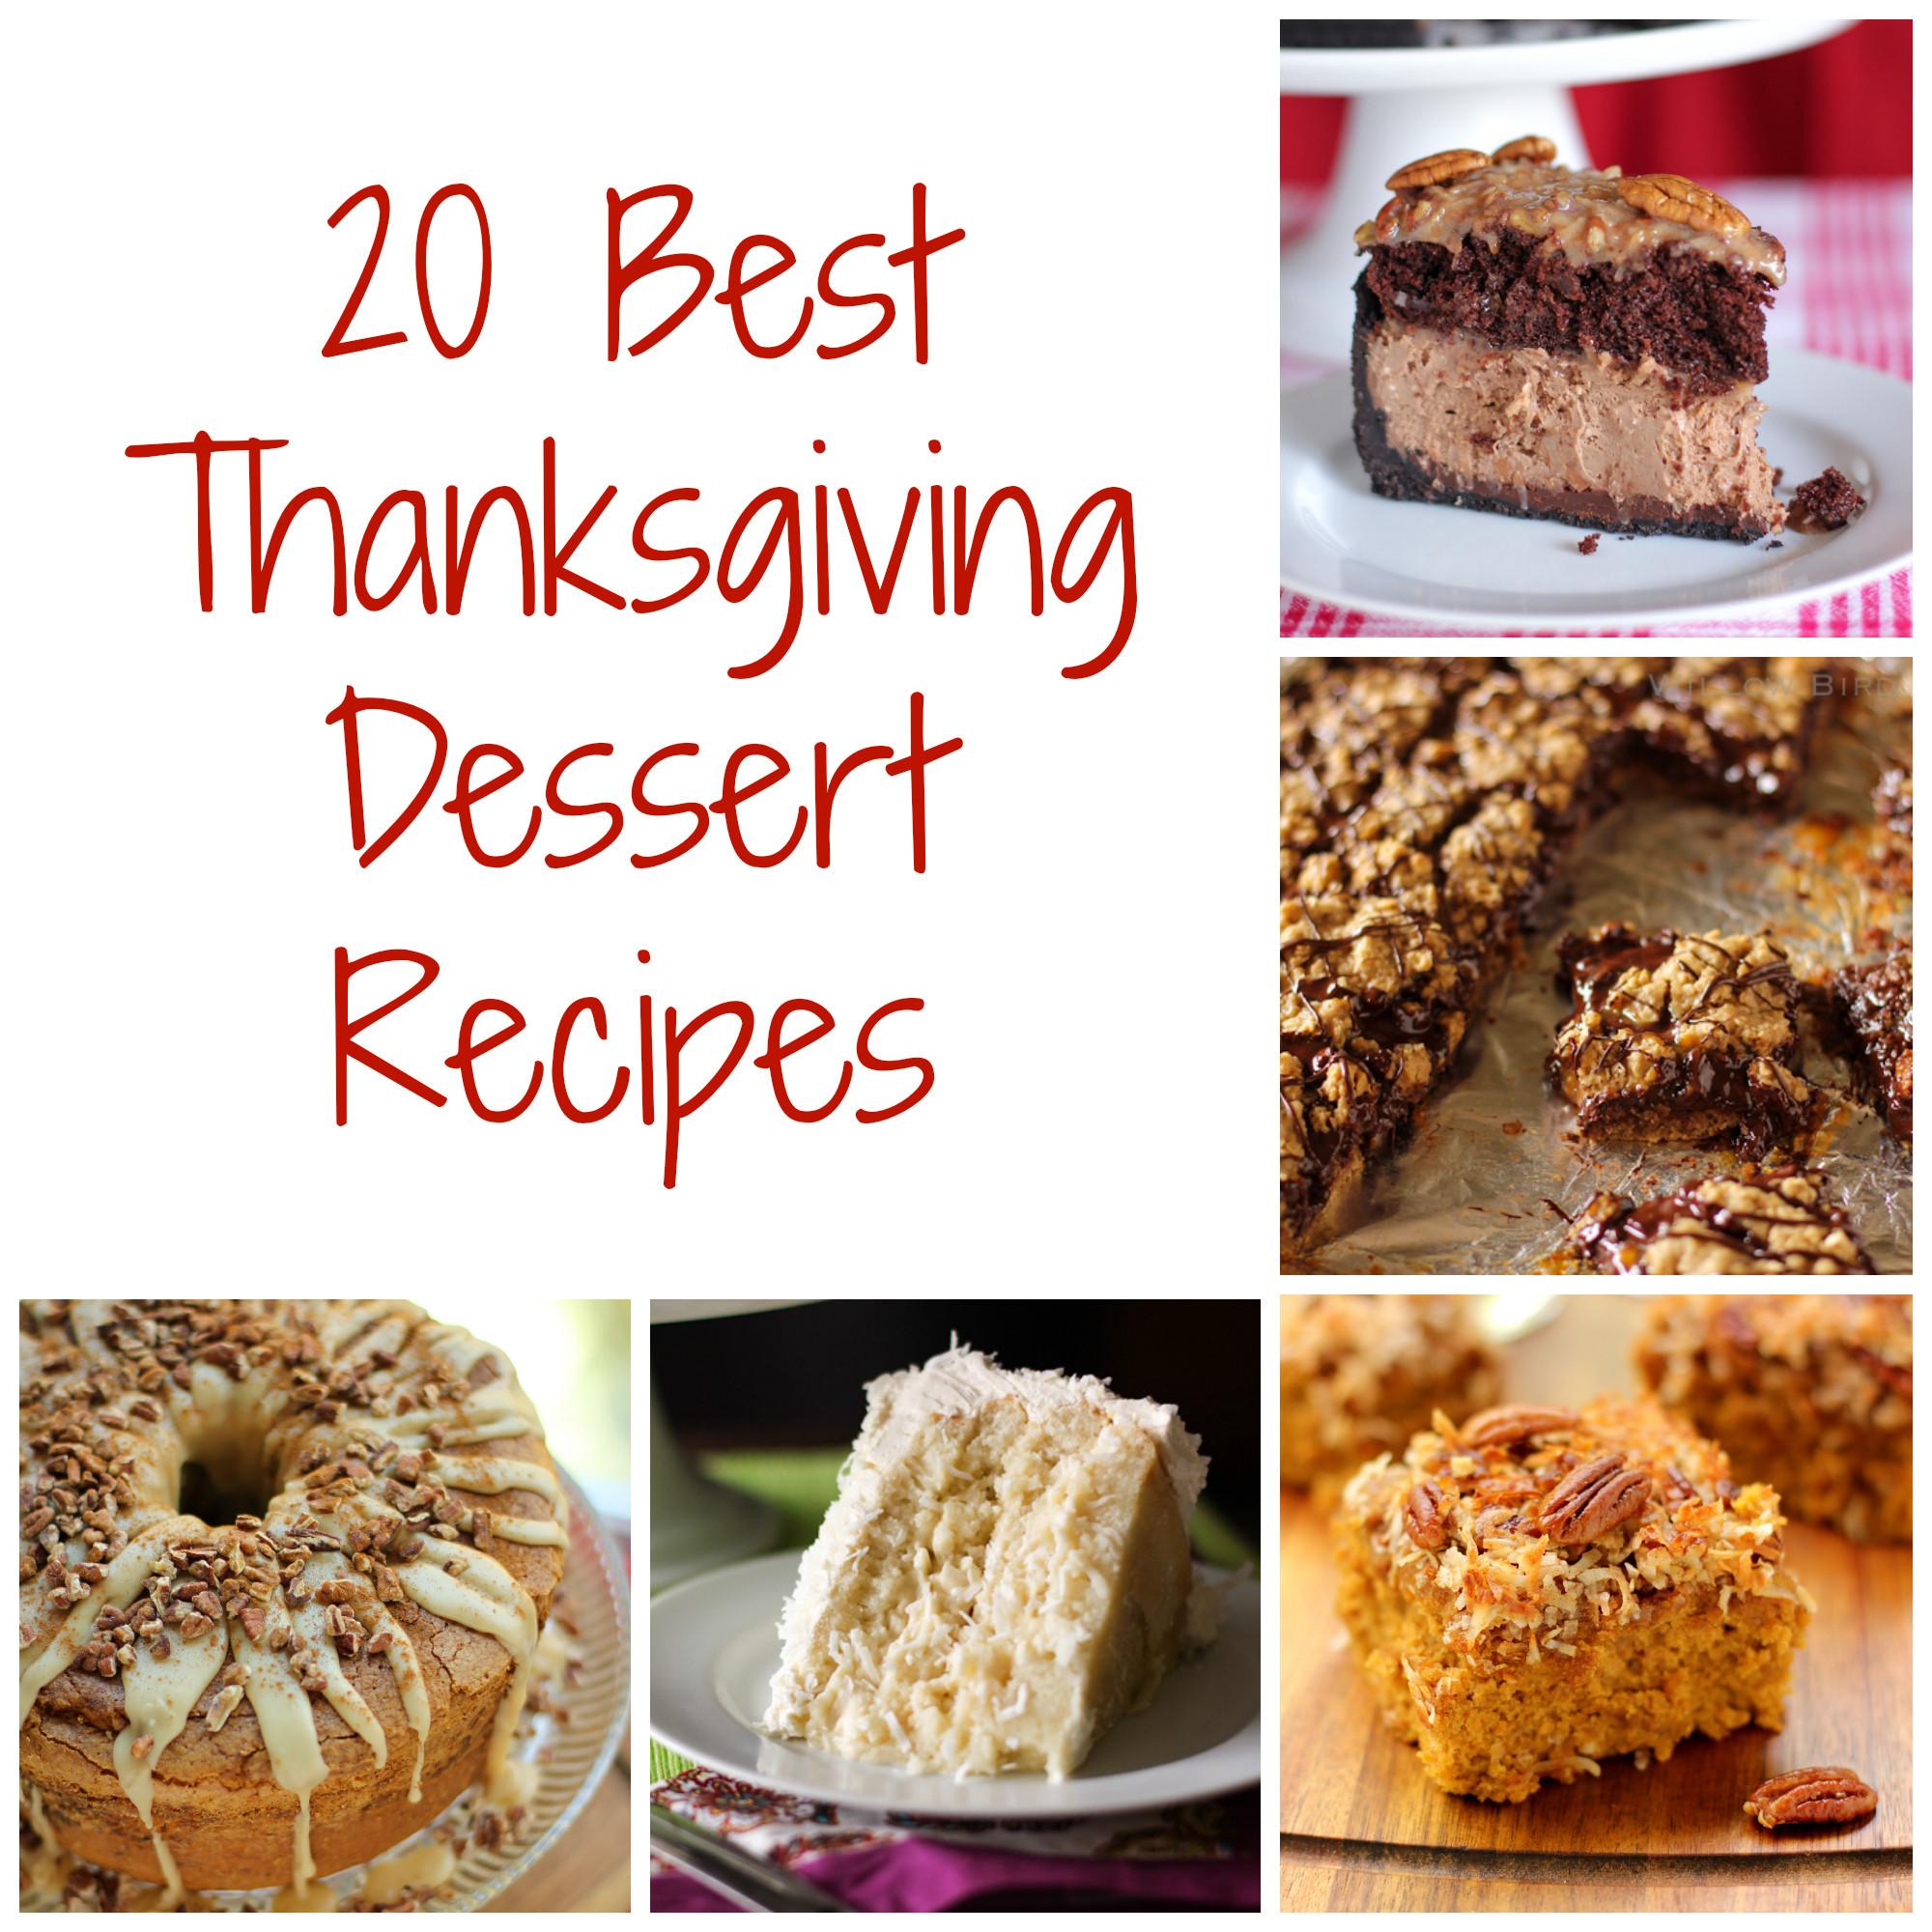 Desserts For Thanksgiving  Thanksgiving Dessert Recipes Willow Bird Baking